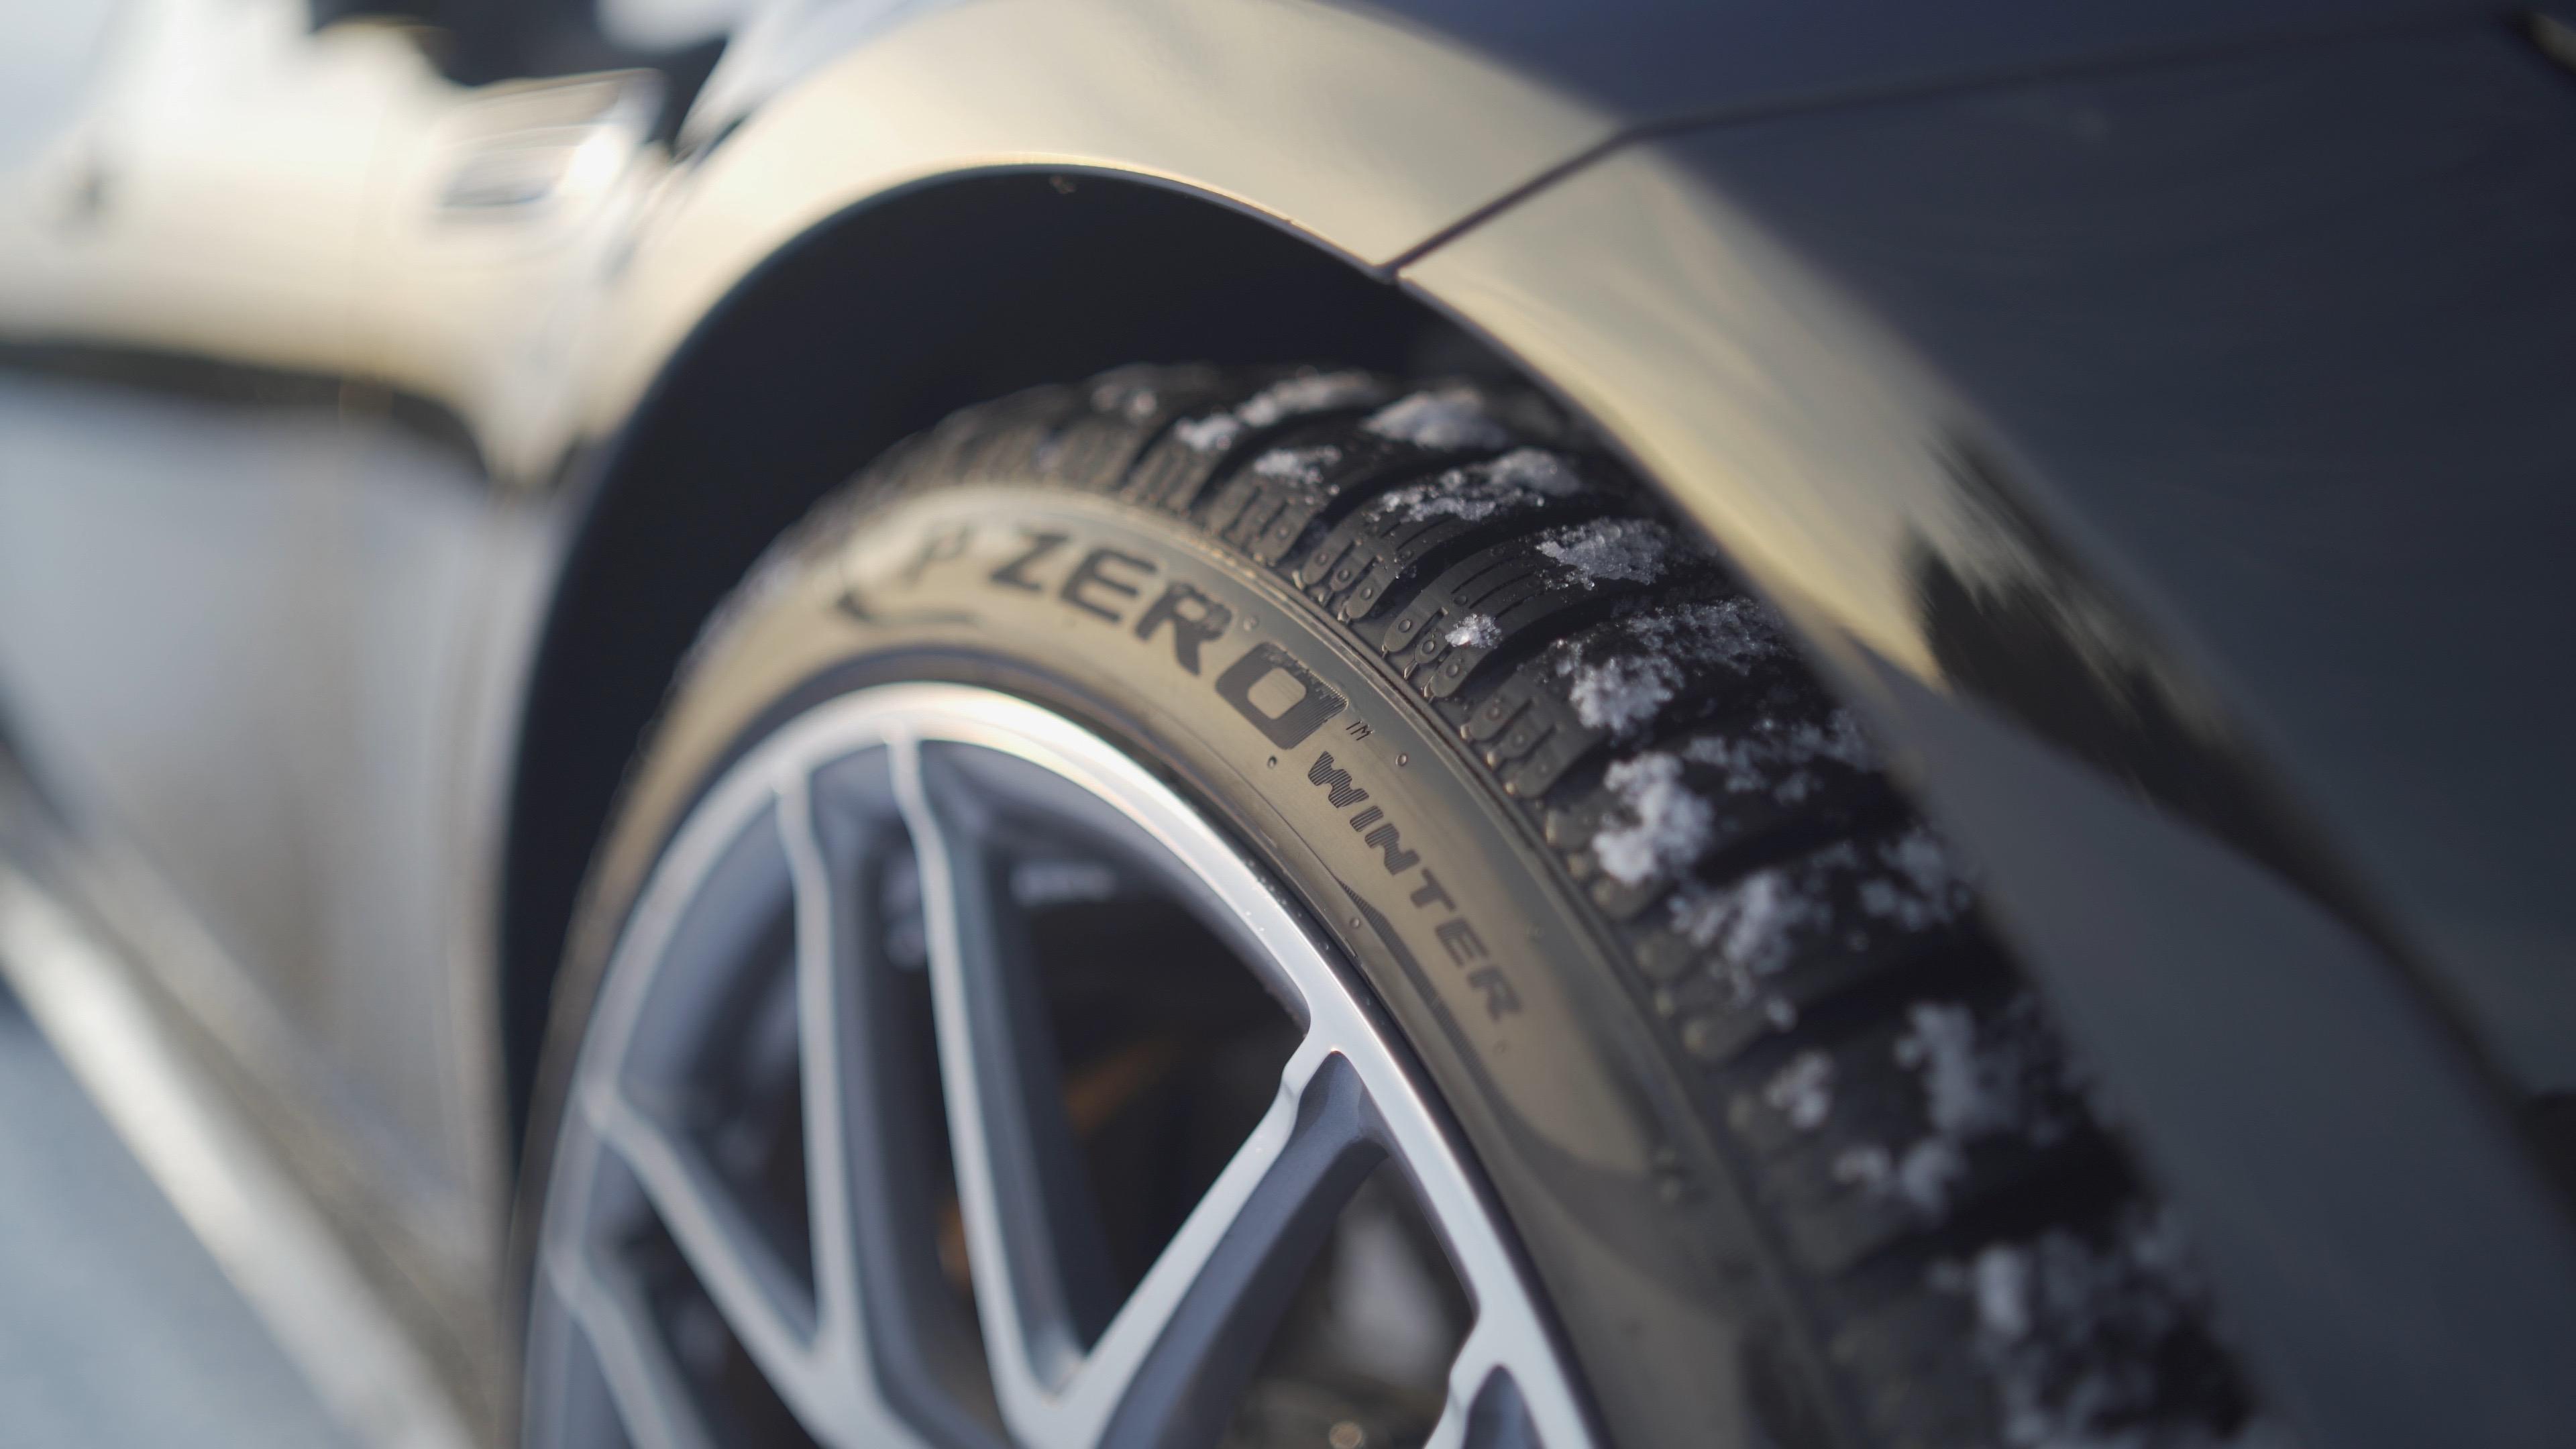 Pirelli, Pirelli showcases P Zero Winter, special track-day tires, ClassicCars.com Journal